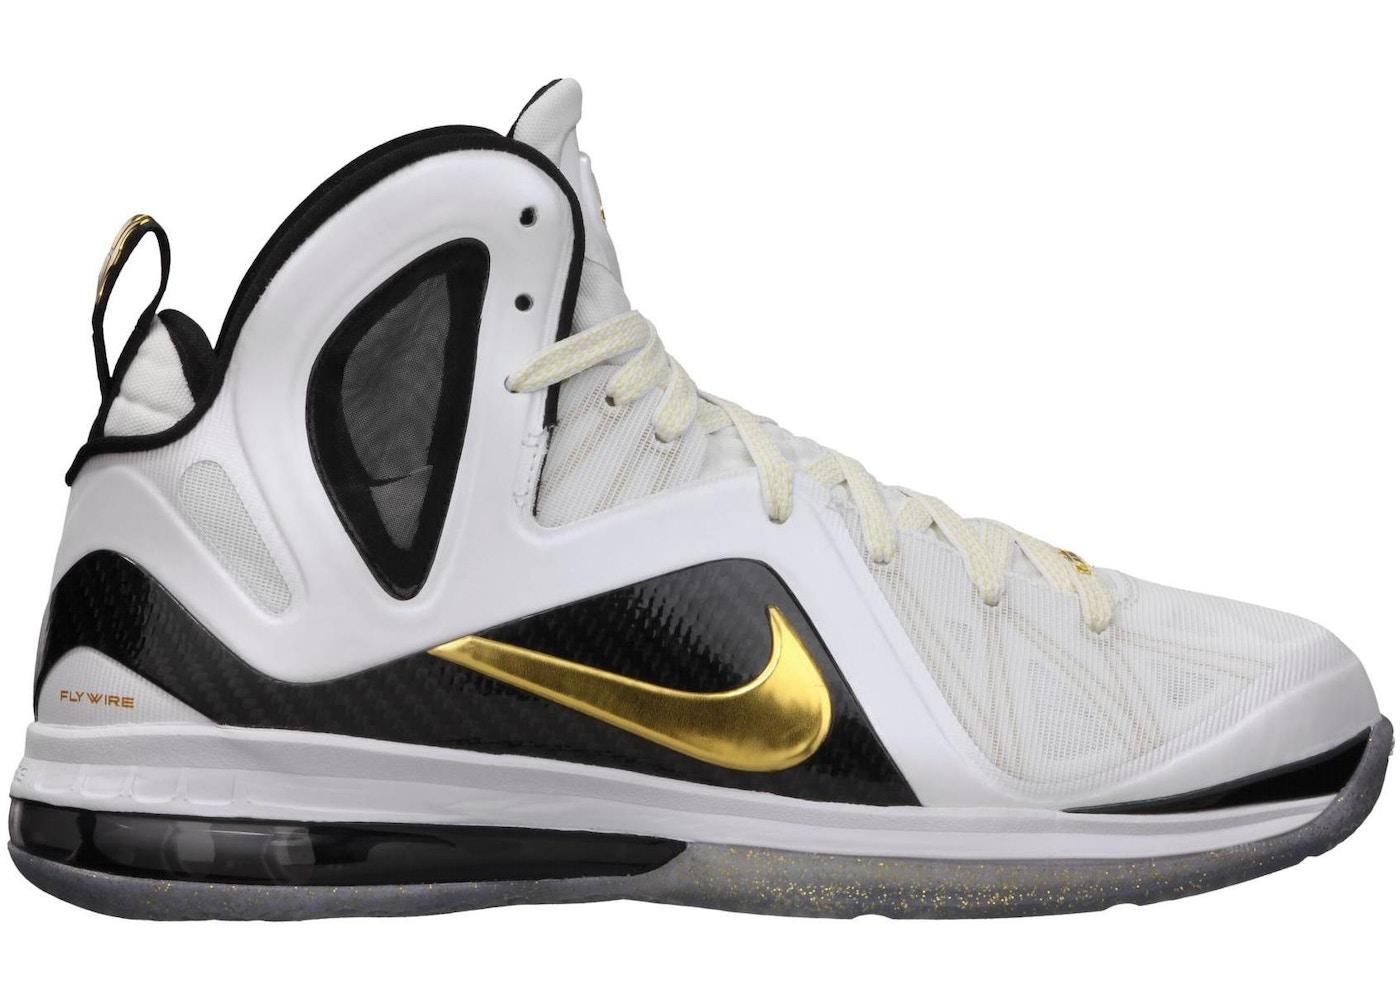 los angeles ad207 f5448 Nike LeBron 9 Shoes - Average Sale Price